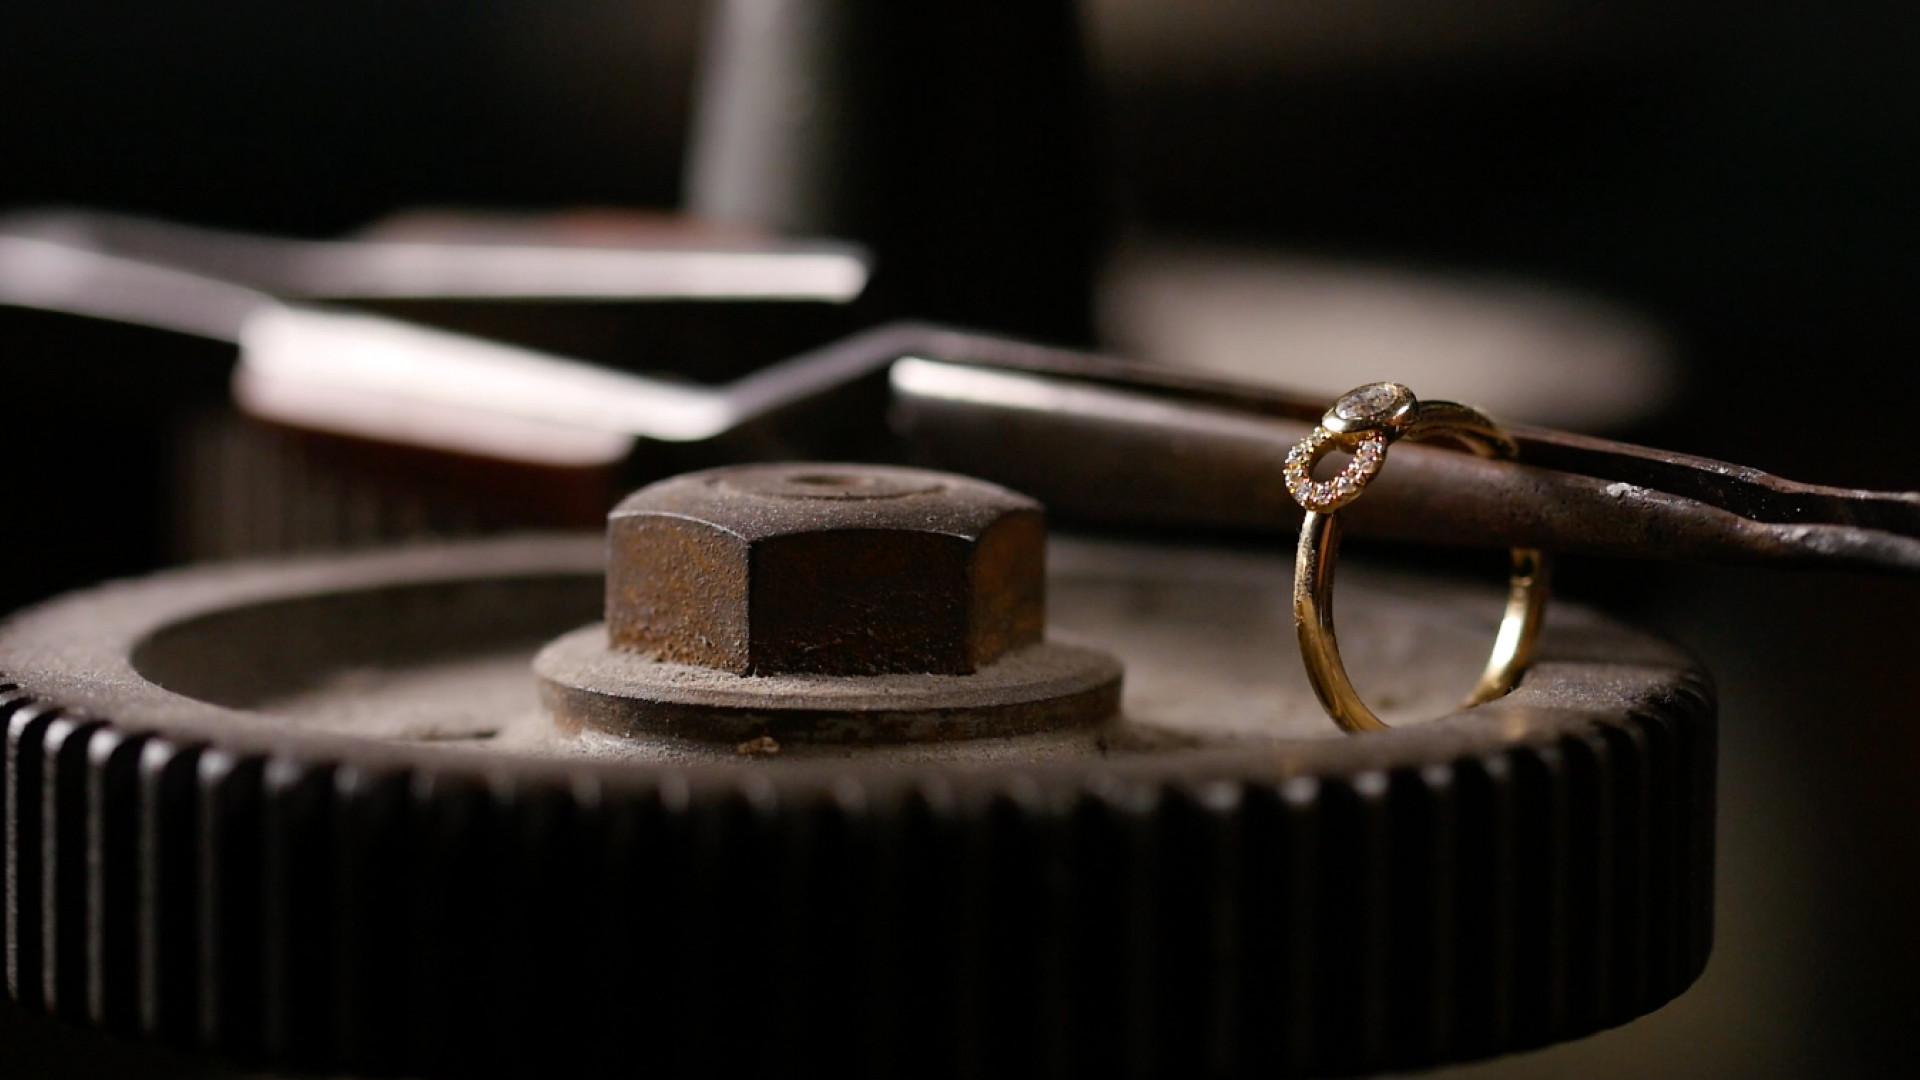 Courbet diamant de synthèse joaillerie durable collection Co